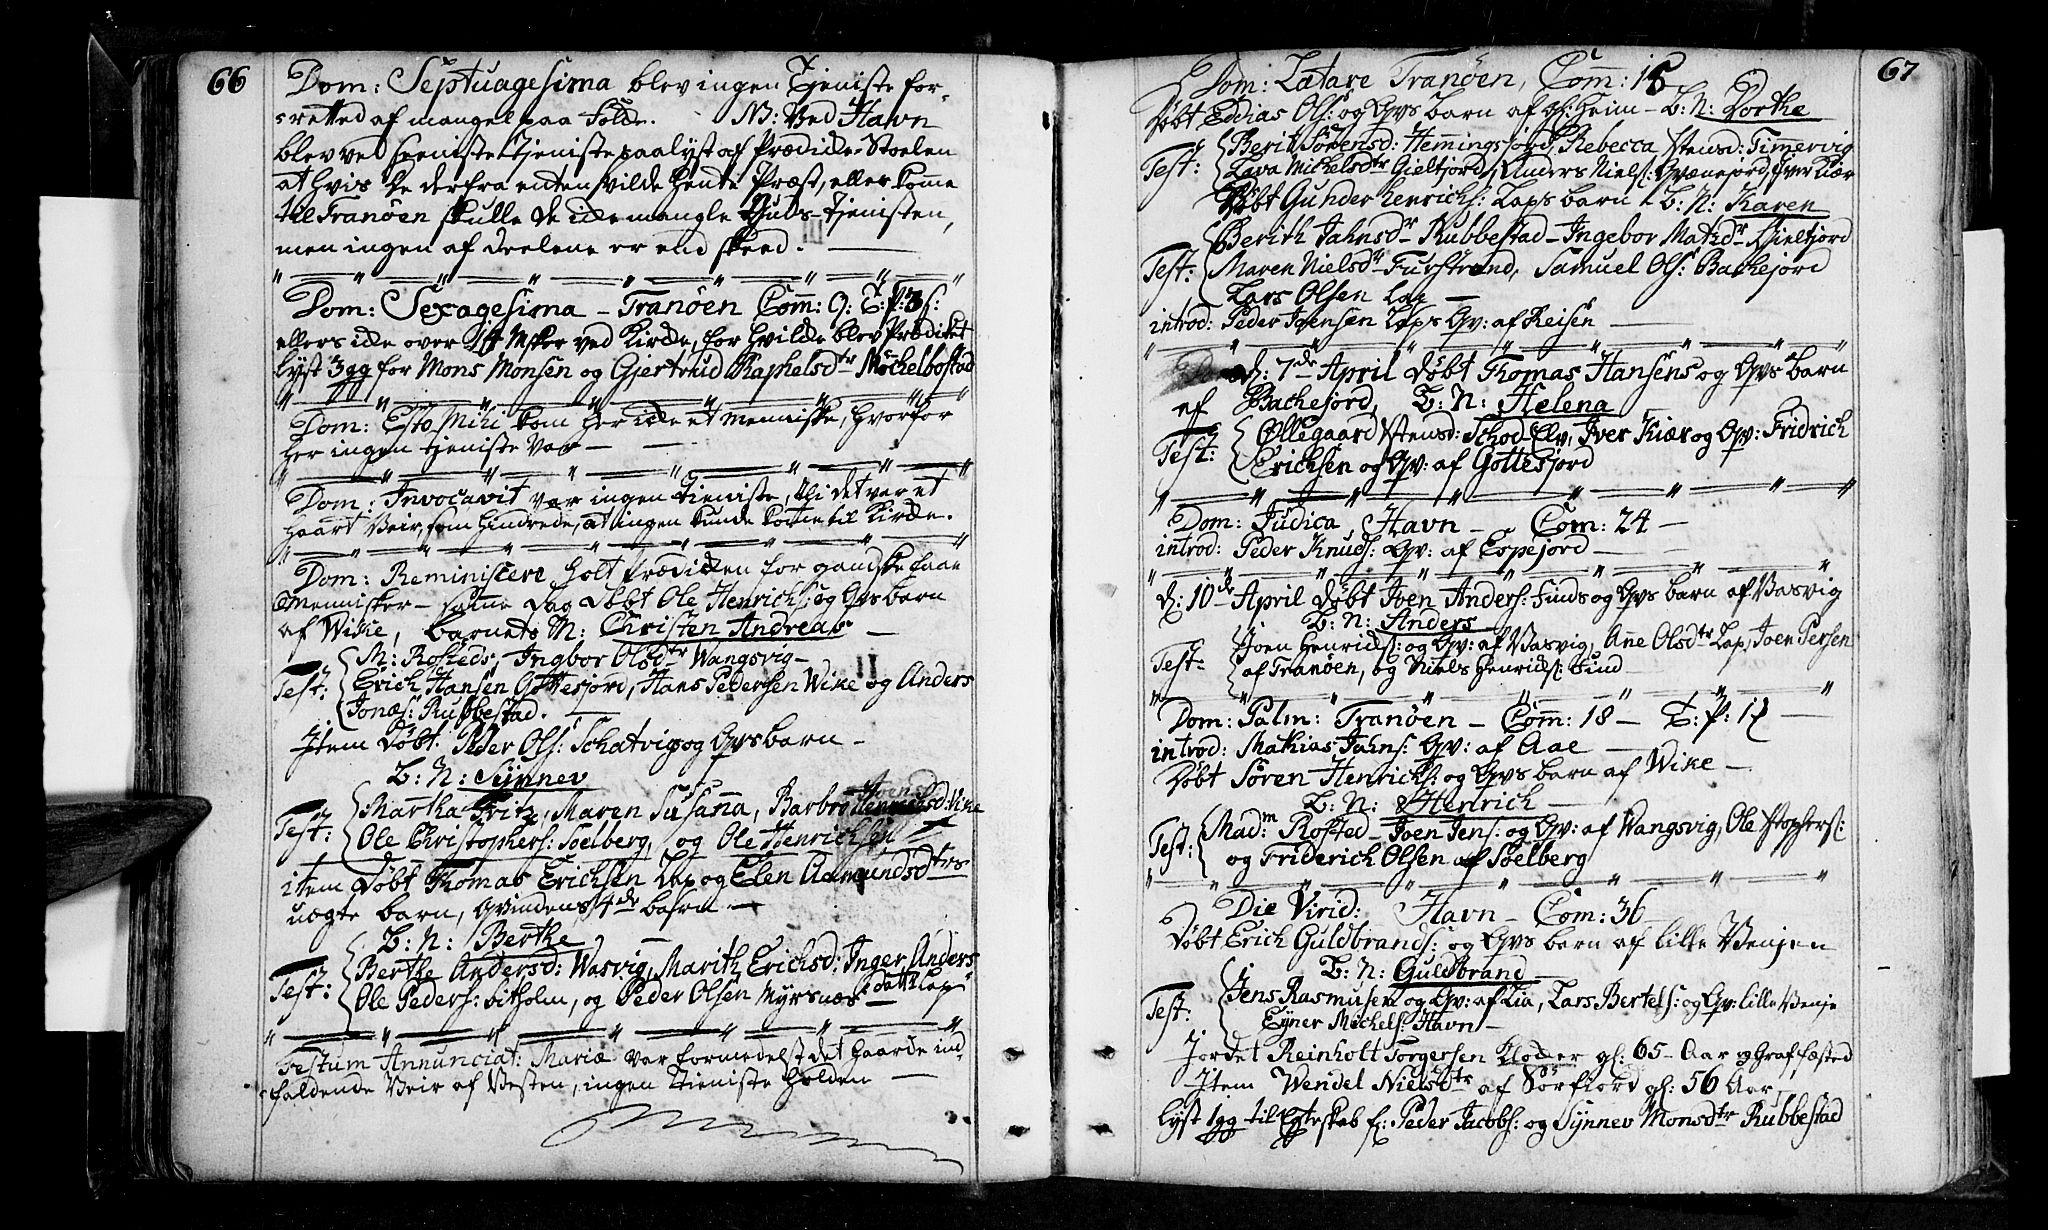 SATØ, Tranøy sokneprestkontor, I/Ia/Iaa/L0001kirke: Ministerialbok nr. 1, 1757-1773, s. 66-67